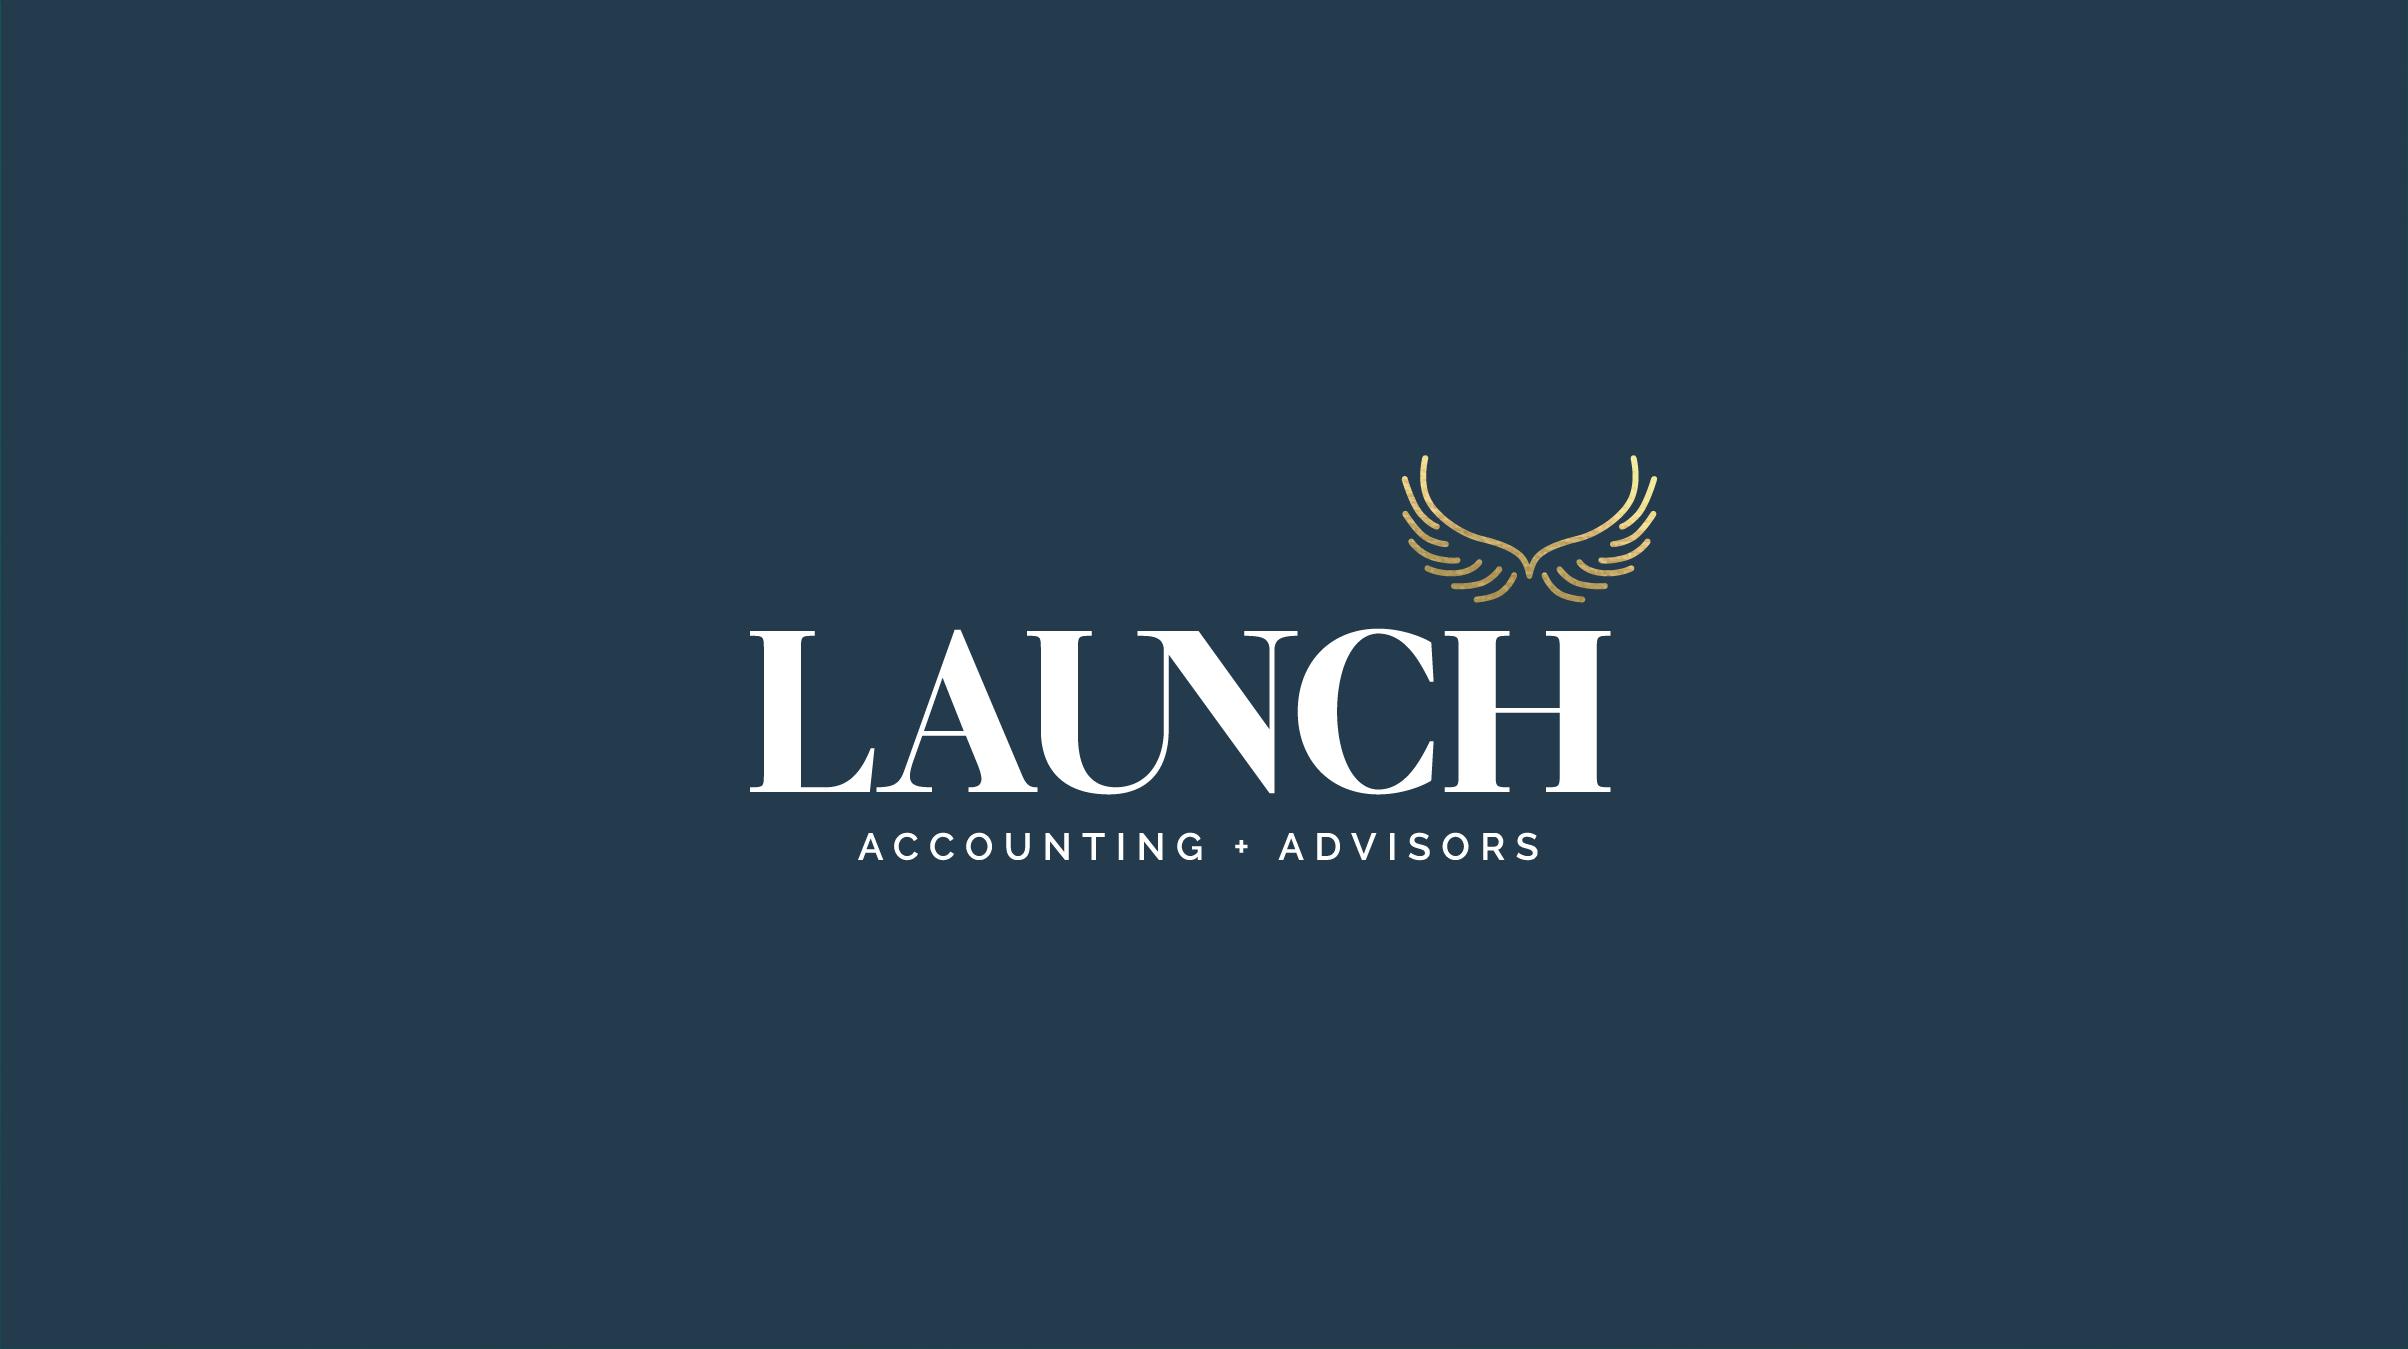 Launch Accoutnign & Advisors Brisbane